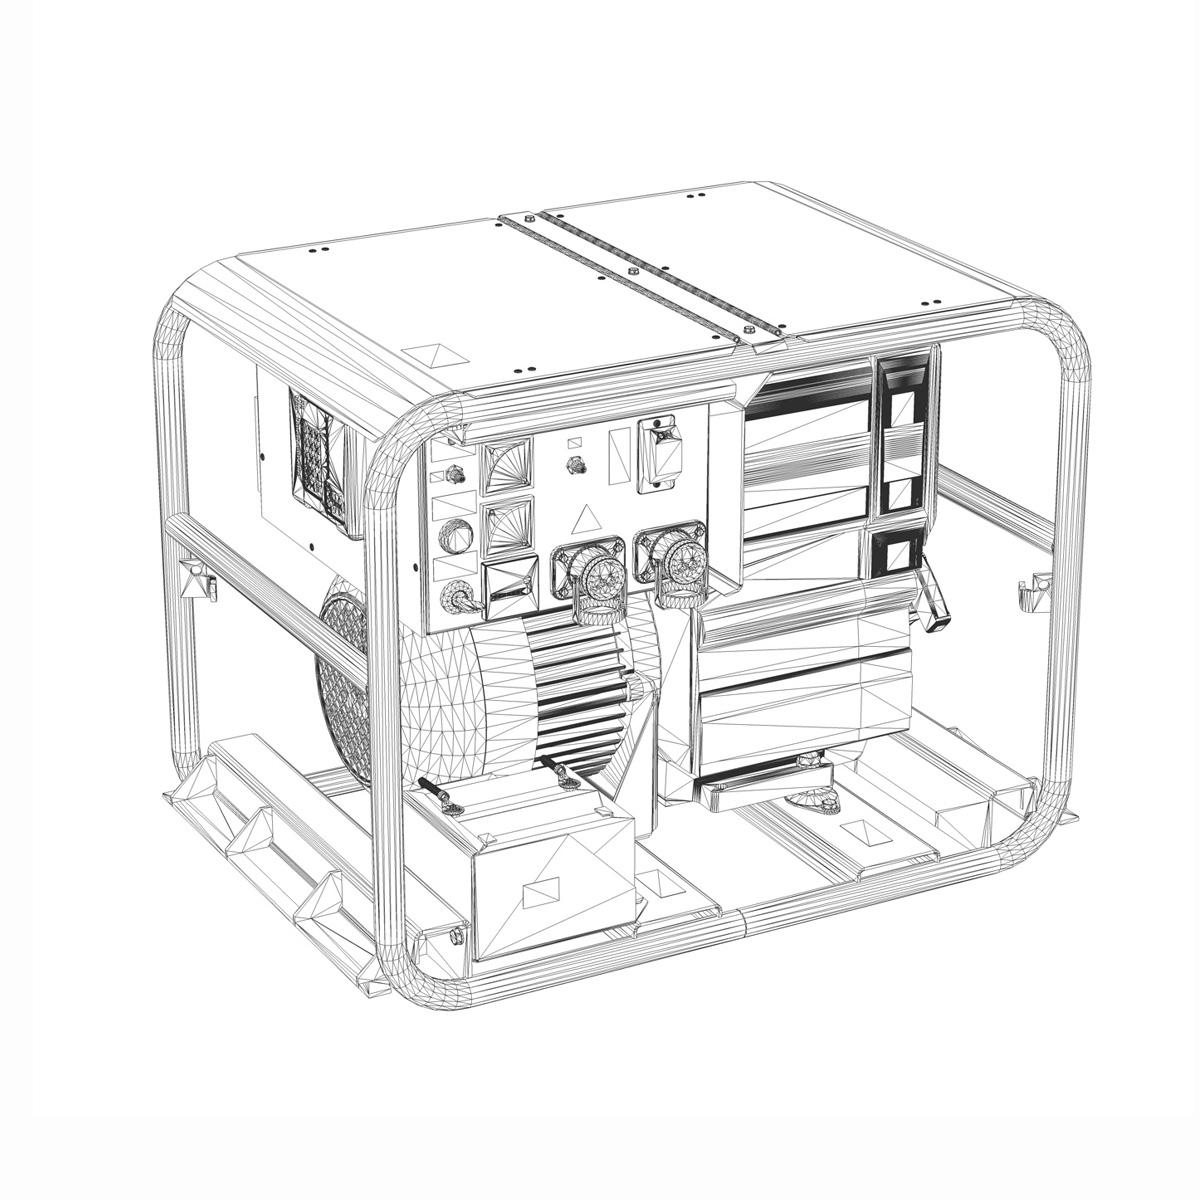 Diesel generator 3d model buy diesel generator 3d model for 3d diagram maker online